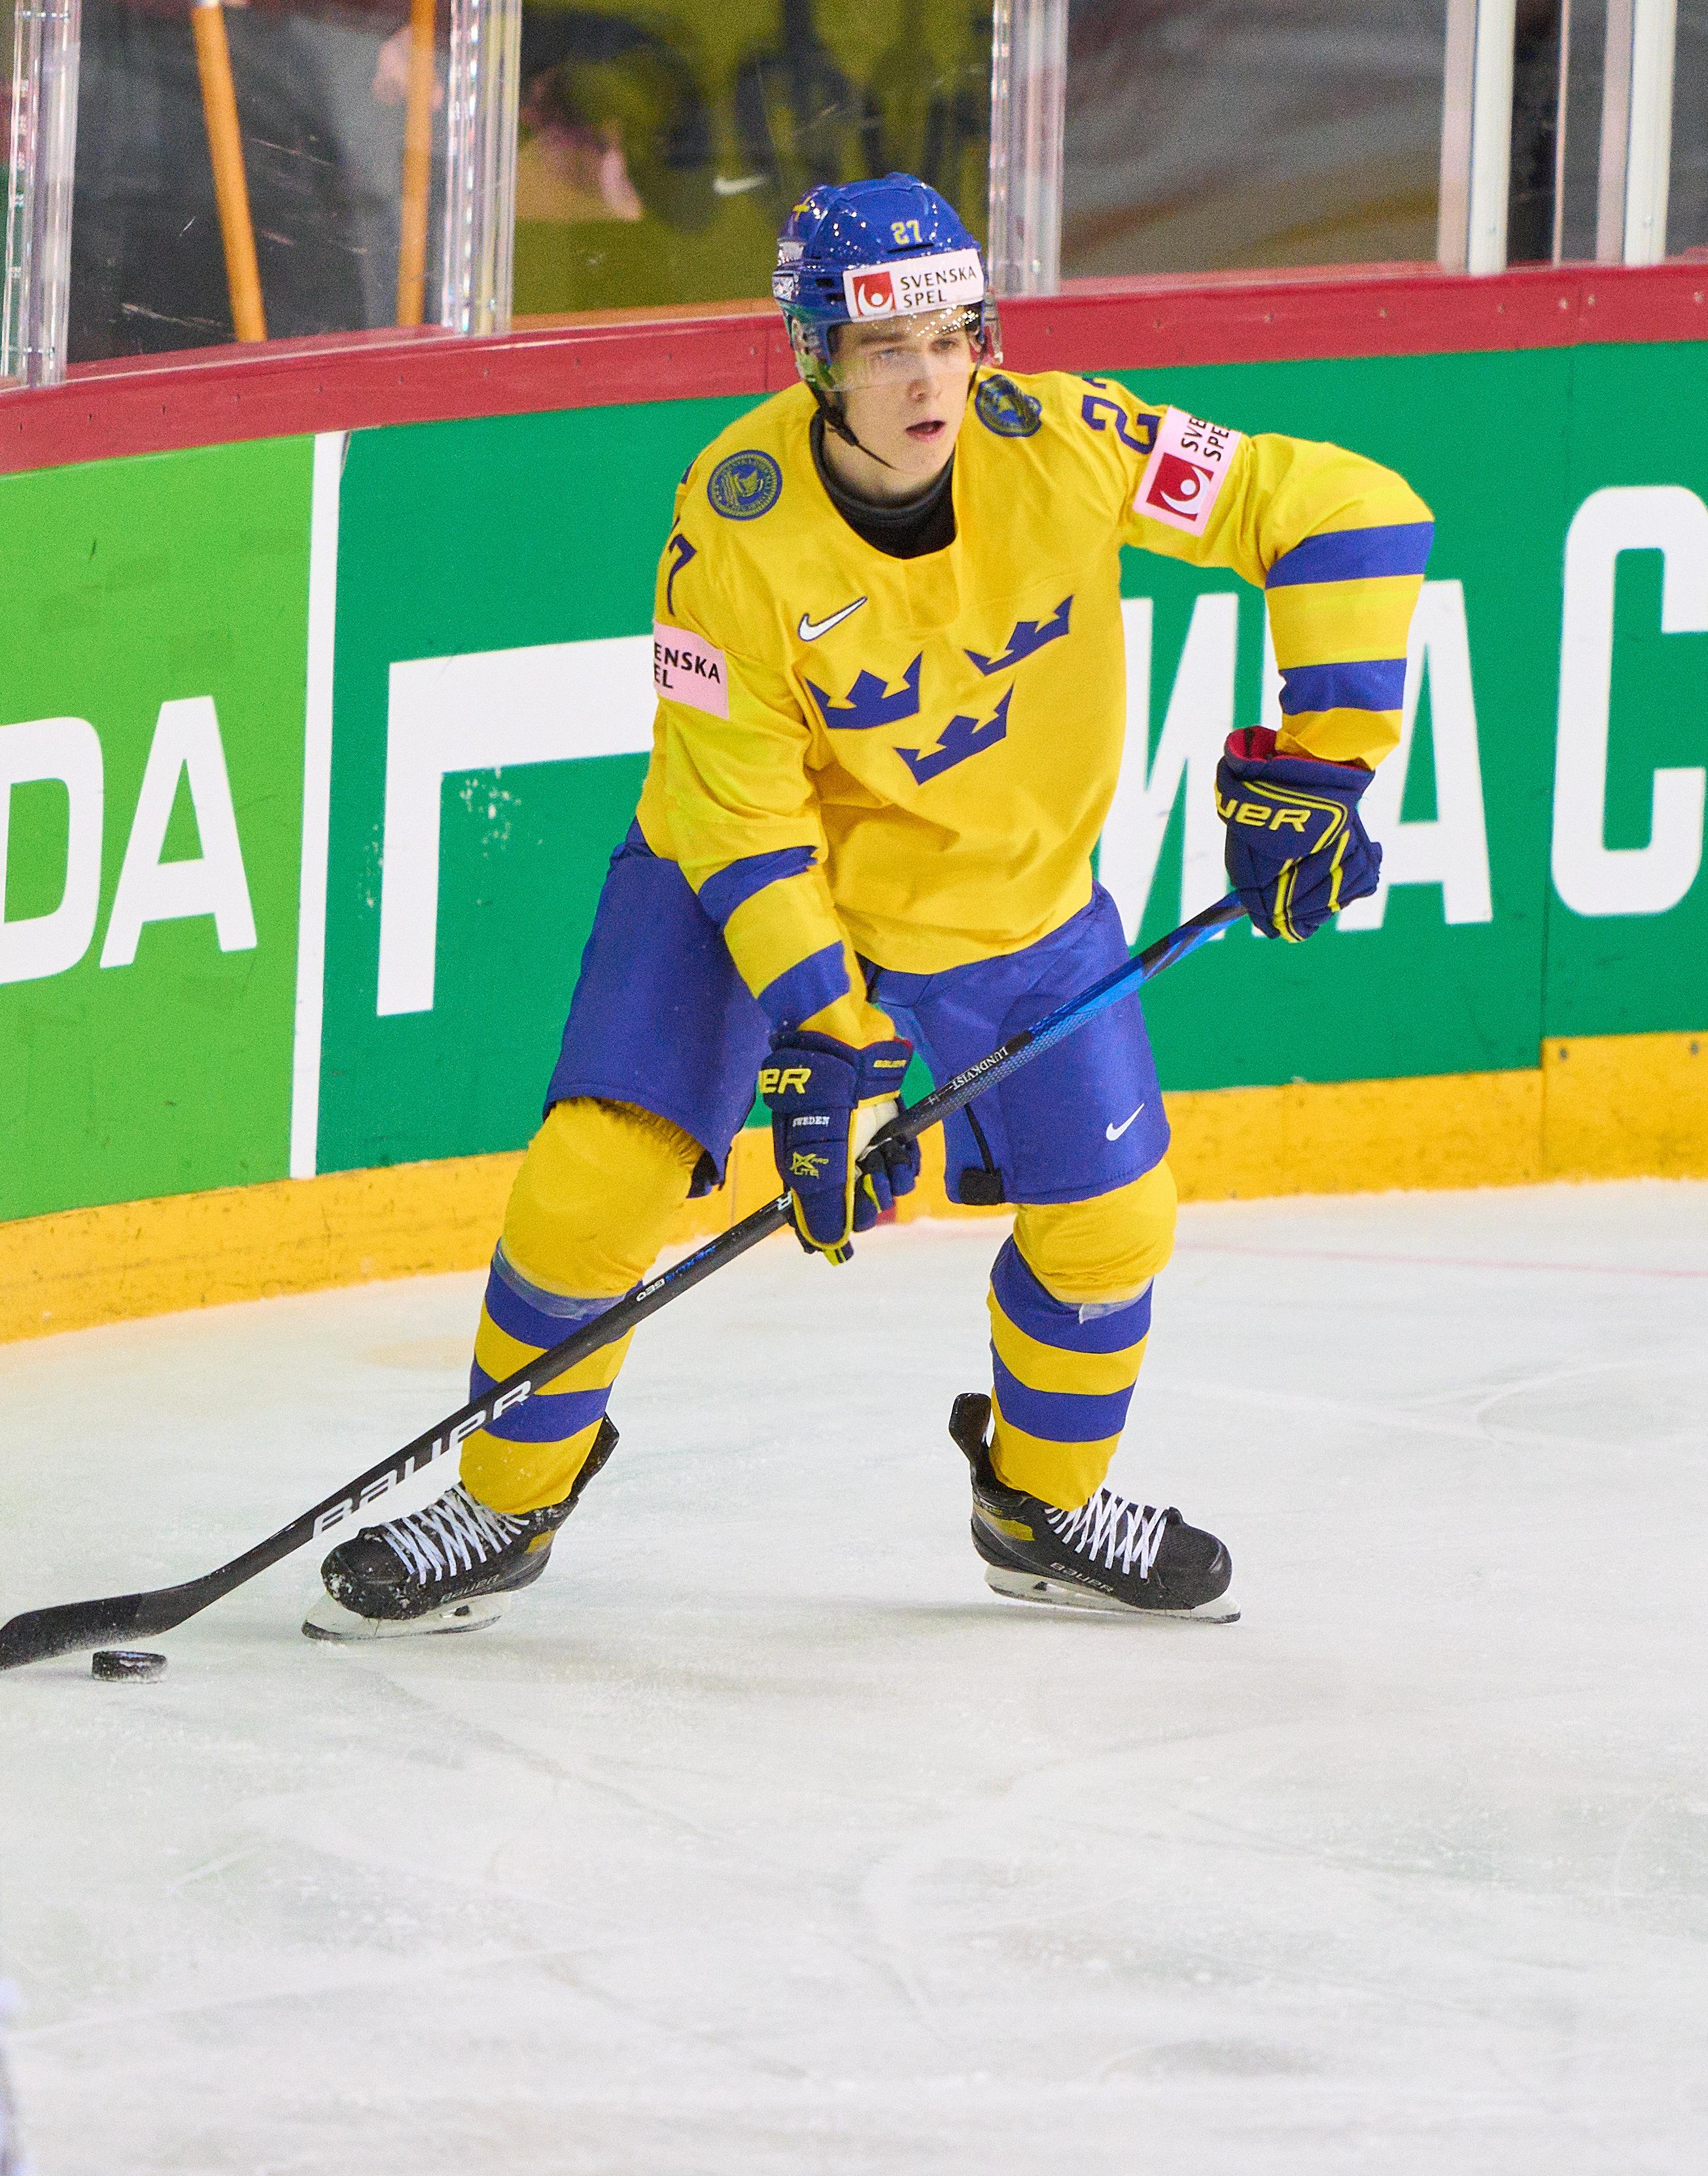 Switzerland v Sweden: Group A - 2021 IIHF Ice Hockey World Championship